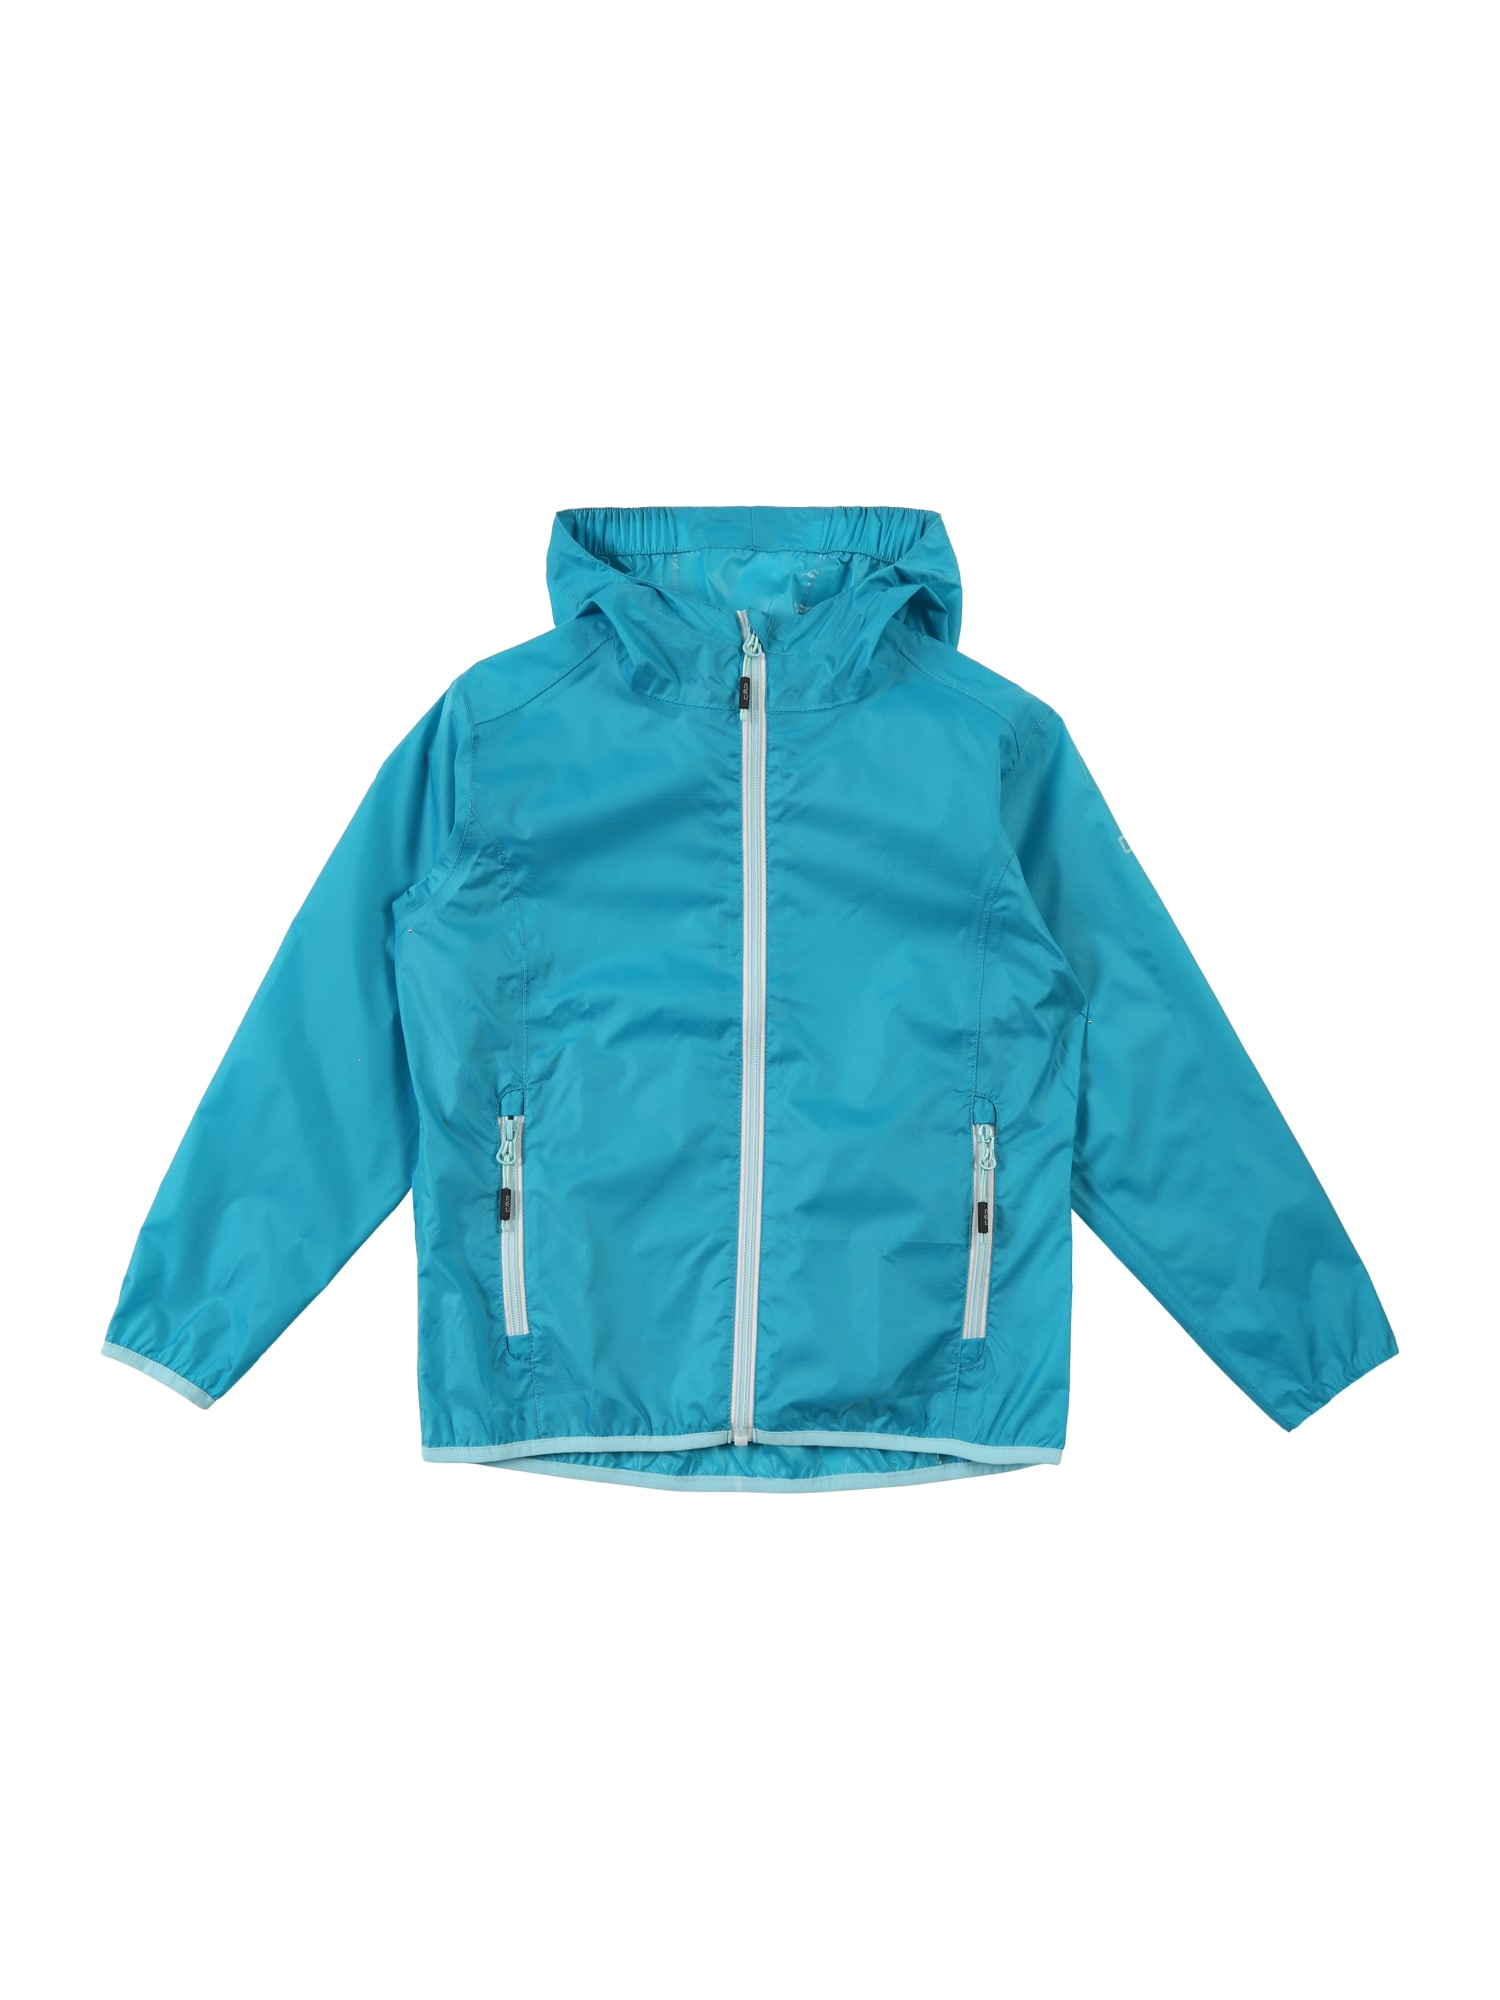 CMP Laisvalaikio striukė 'Fix Hood Jacket' turkio spalva